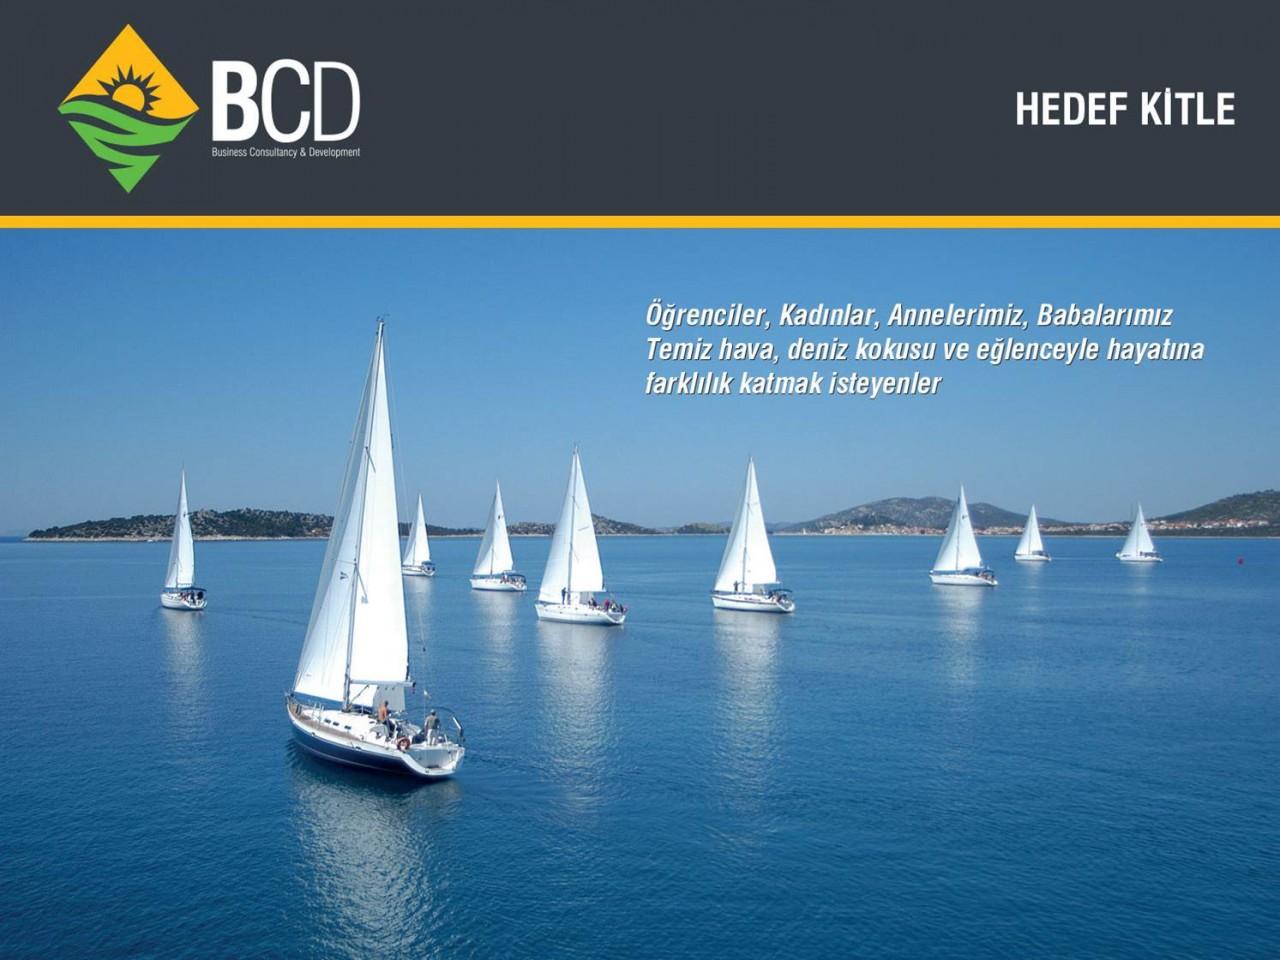 bcdturkey yelken liderlik takim ruhu 3 Leadership & Team Work & Sailing